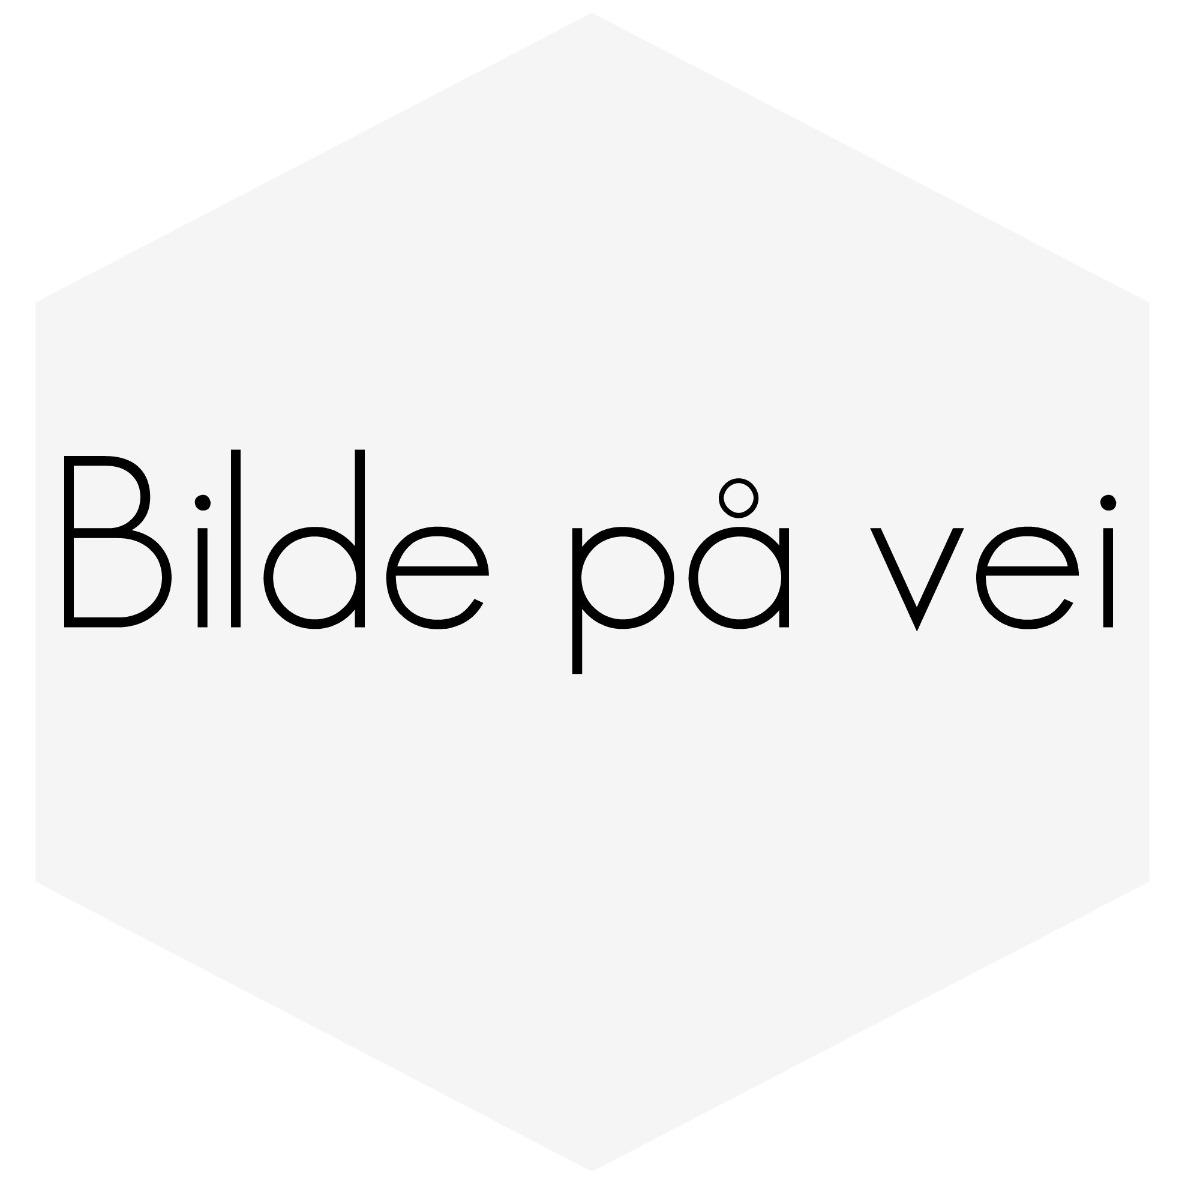 STEMPELFJÆRSATS FOR 1 MOTOR VOLVO D24/D24T  STD DIM